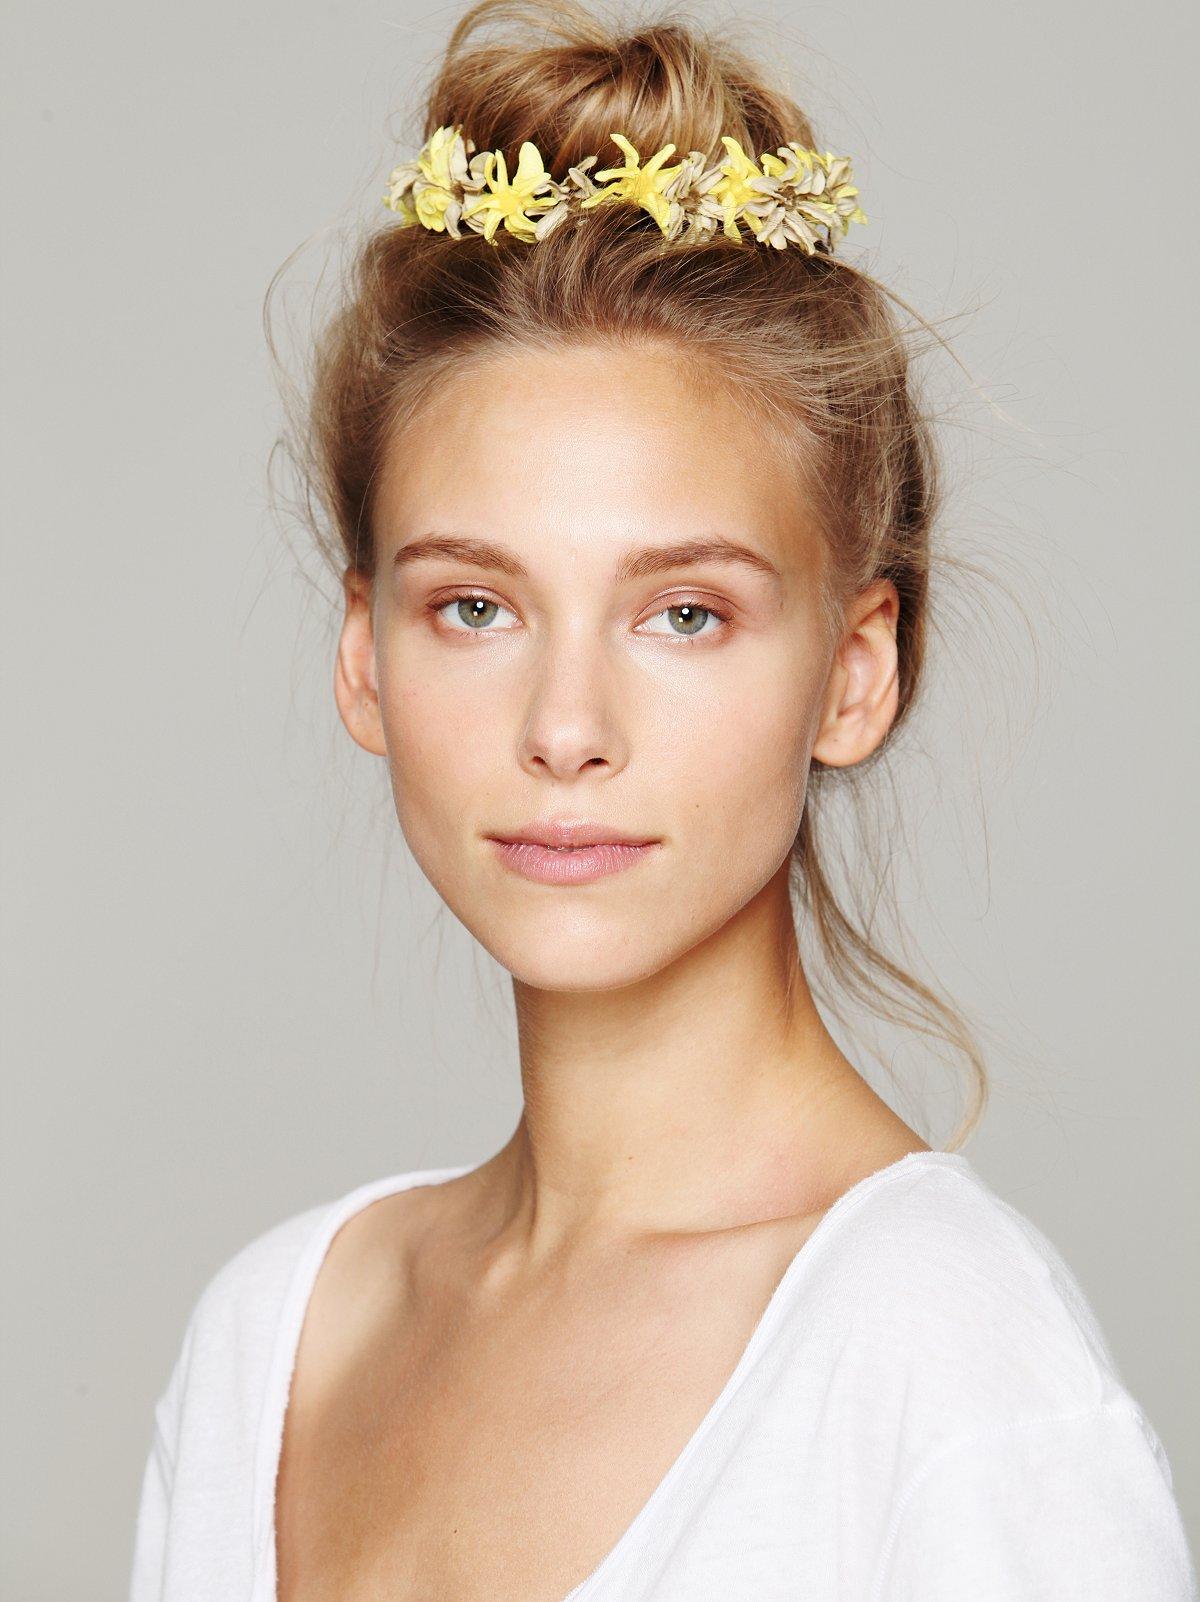 Bun Floral Crowns